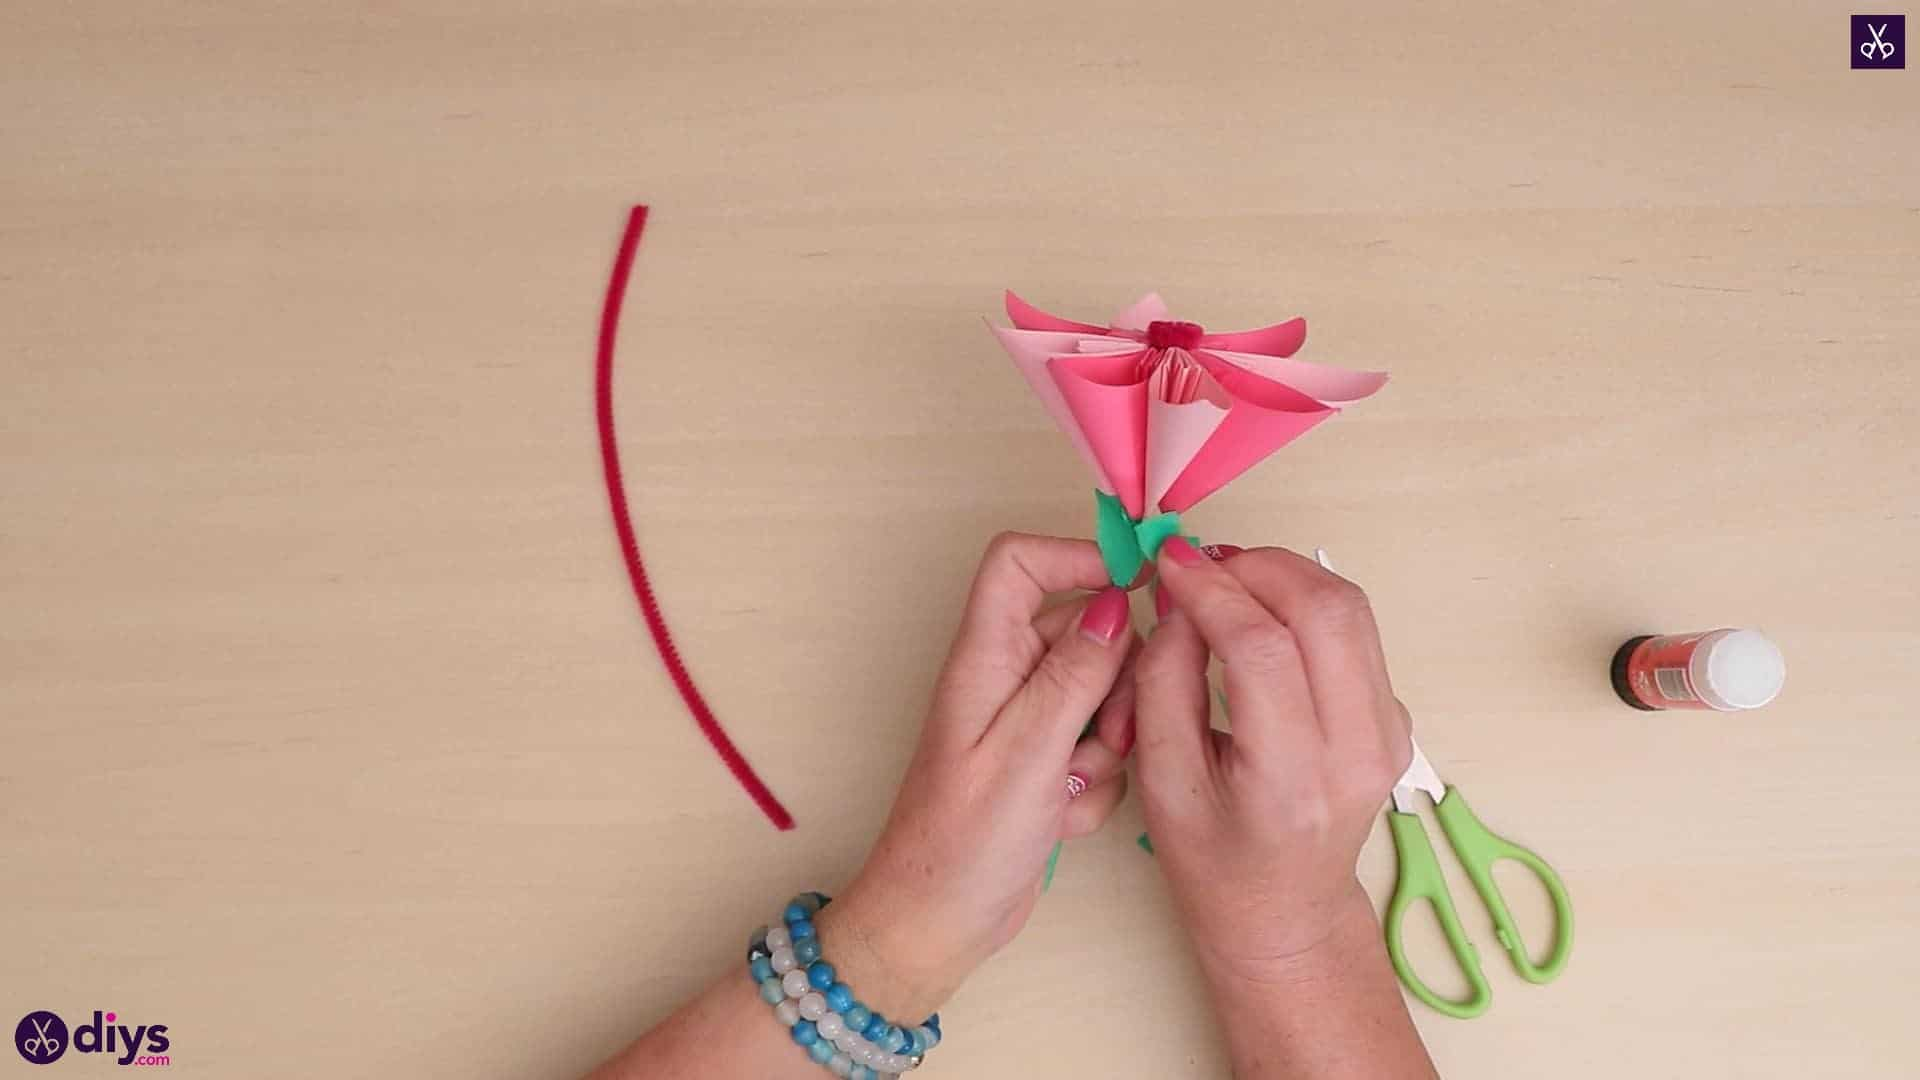 Diy 3d paper flower craft